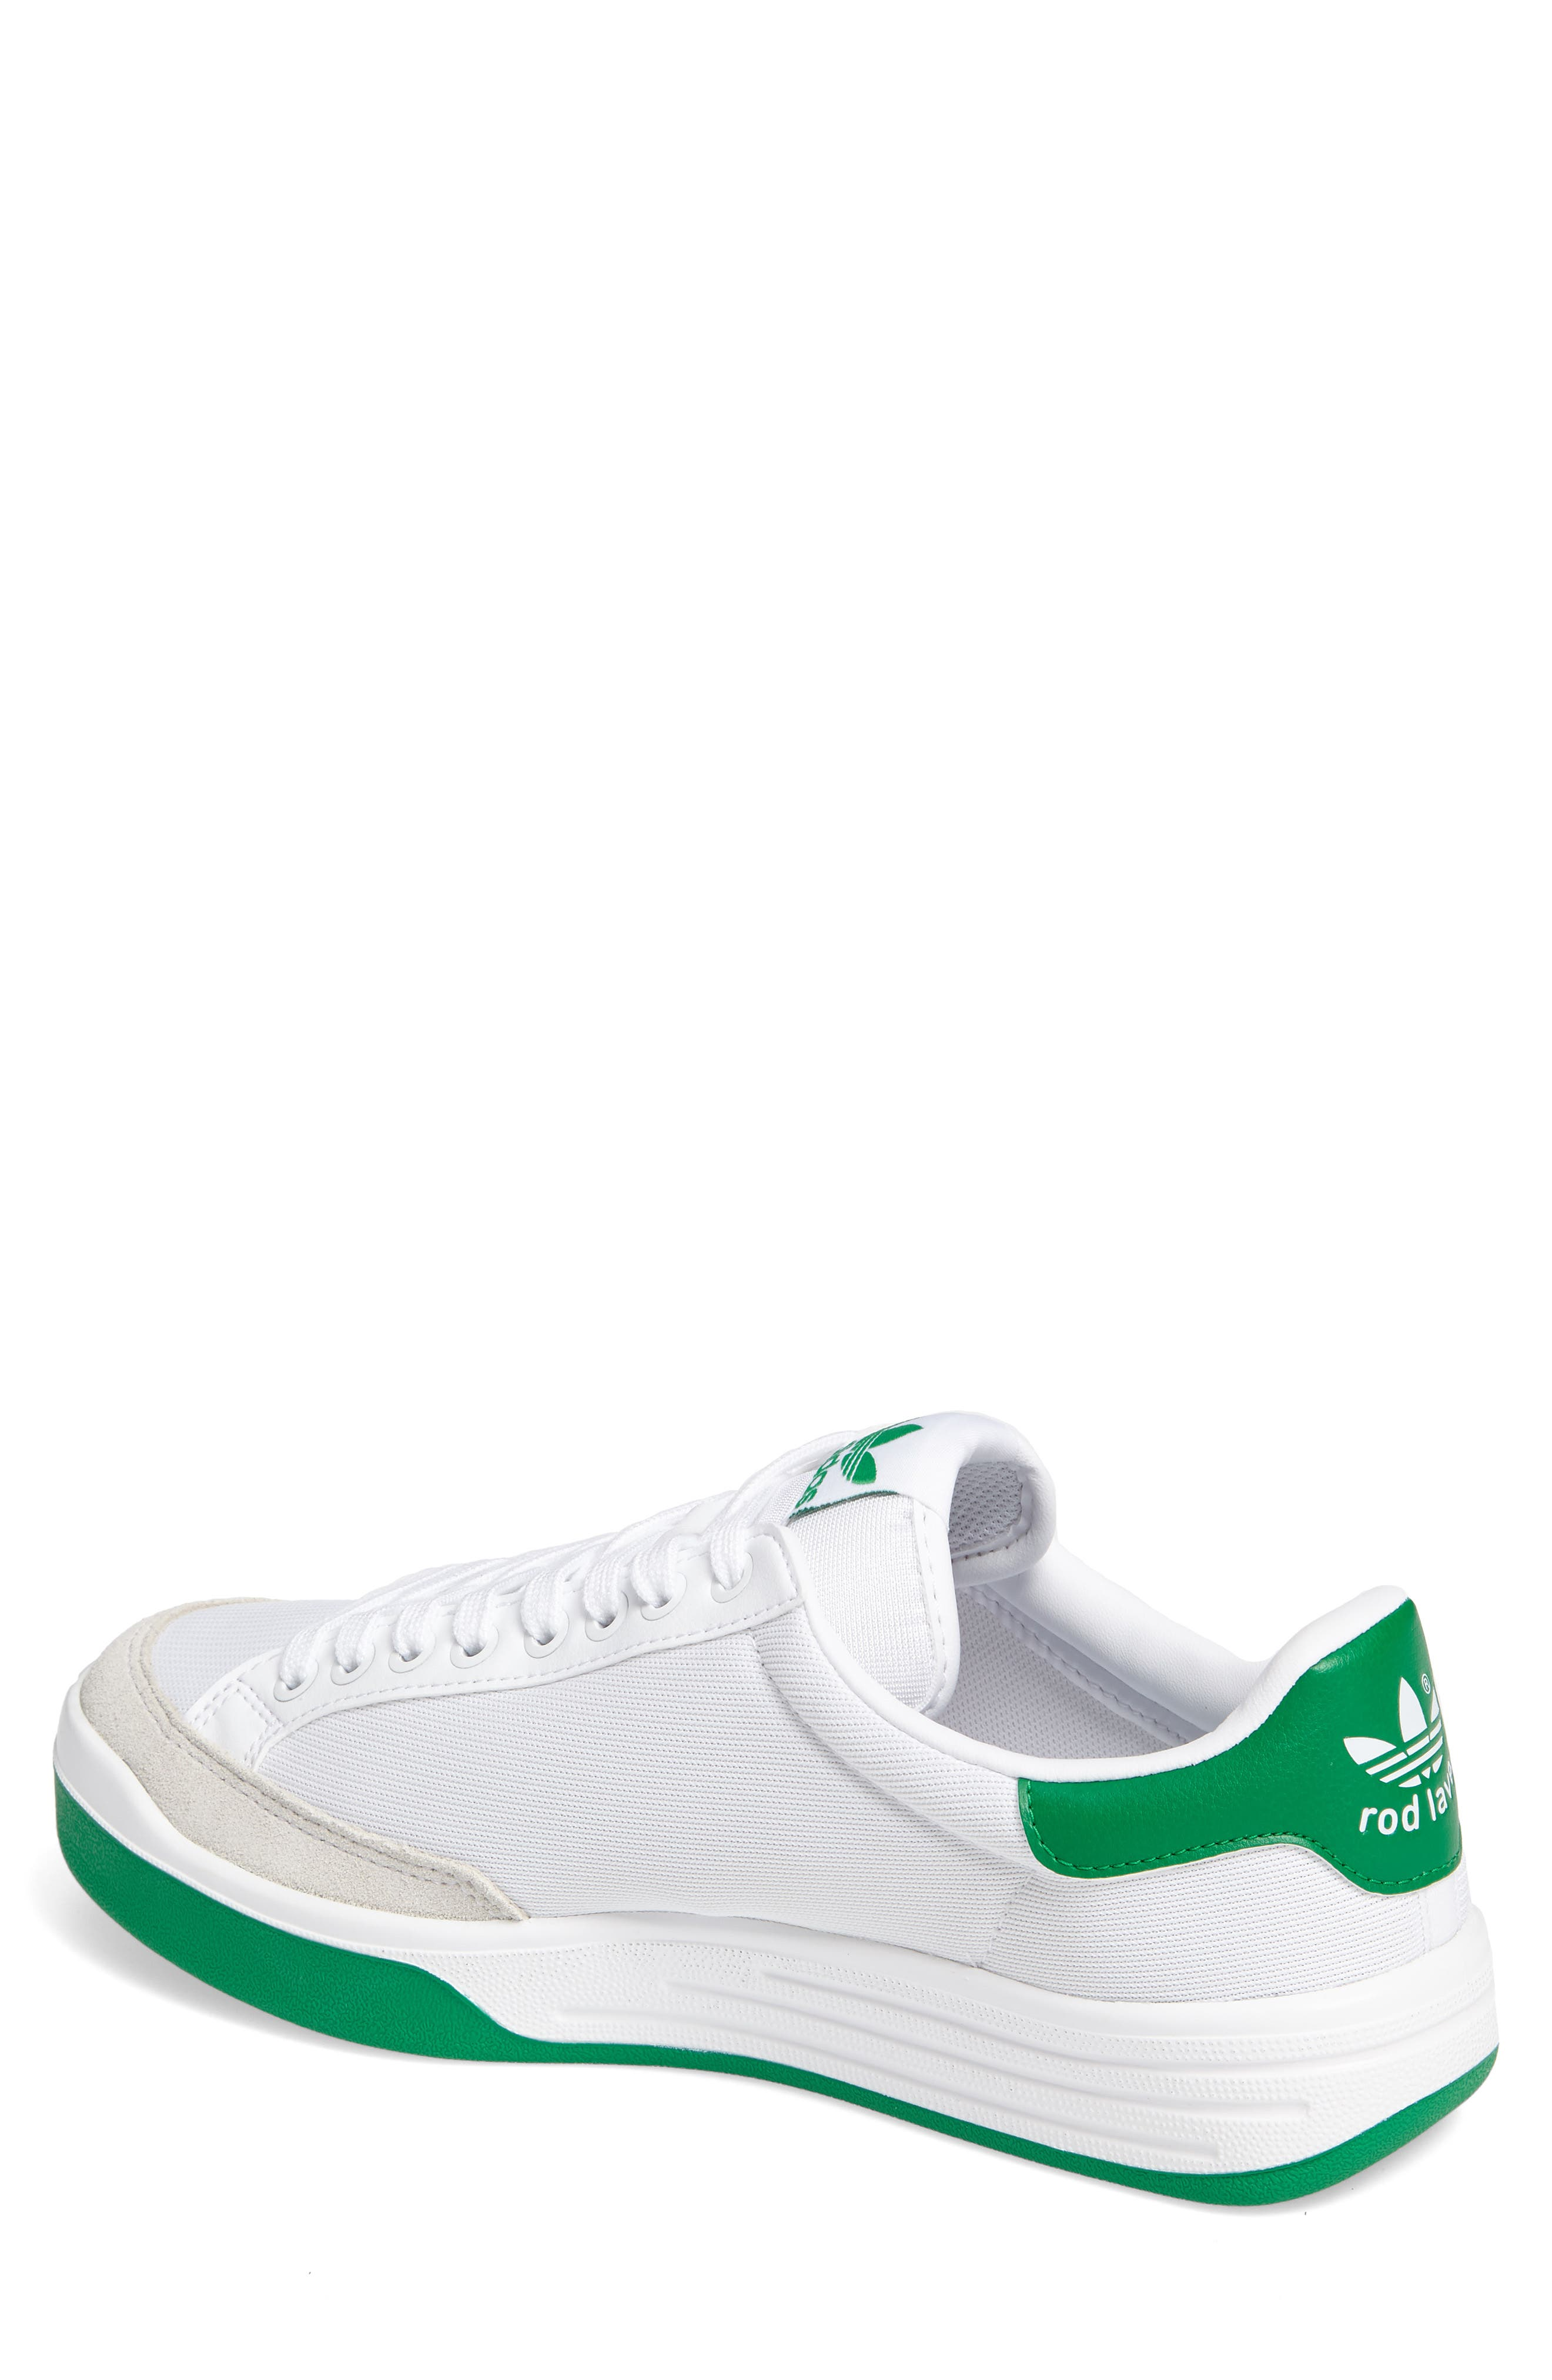 ADIDAS,                             Rod Laver Super Sneaker,                             Alternate thumbnail 2, color,                             100